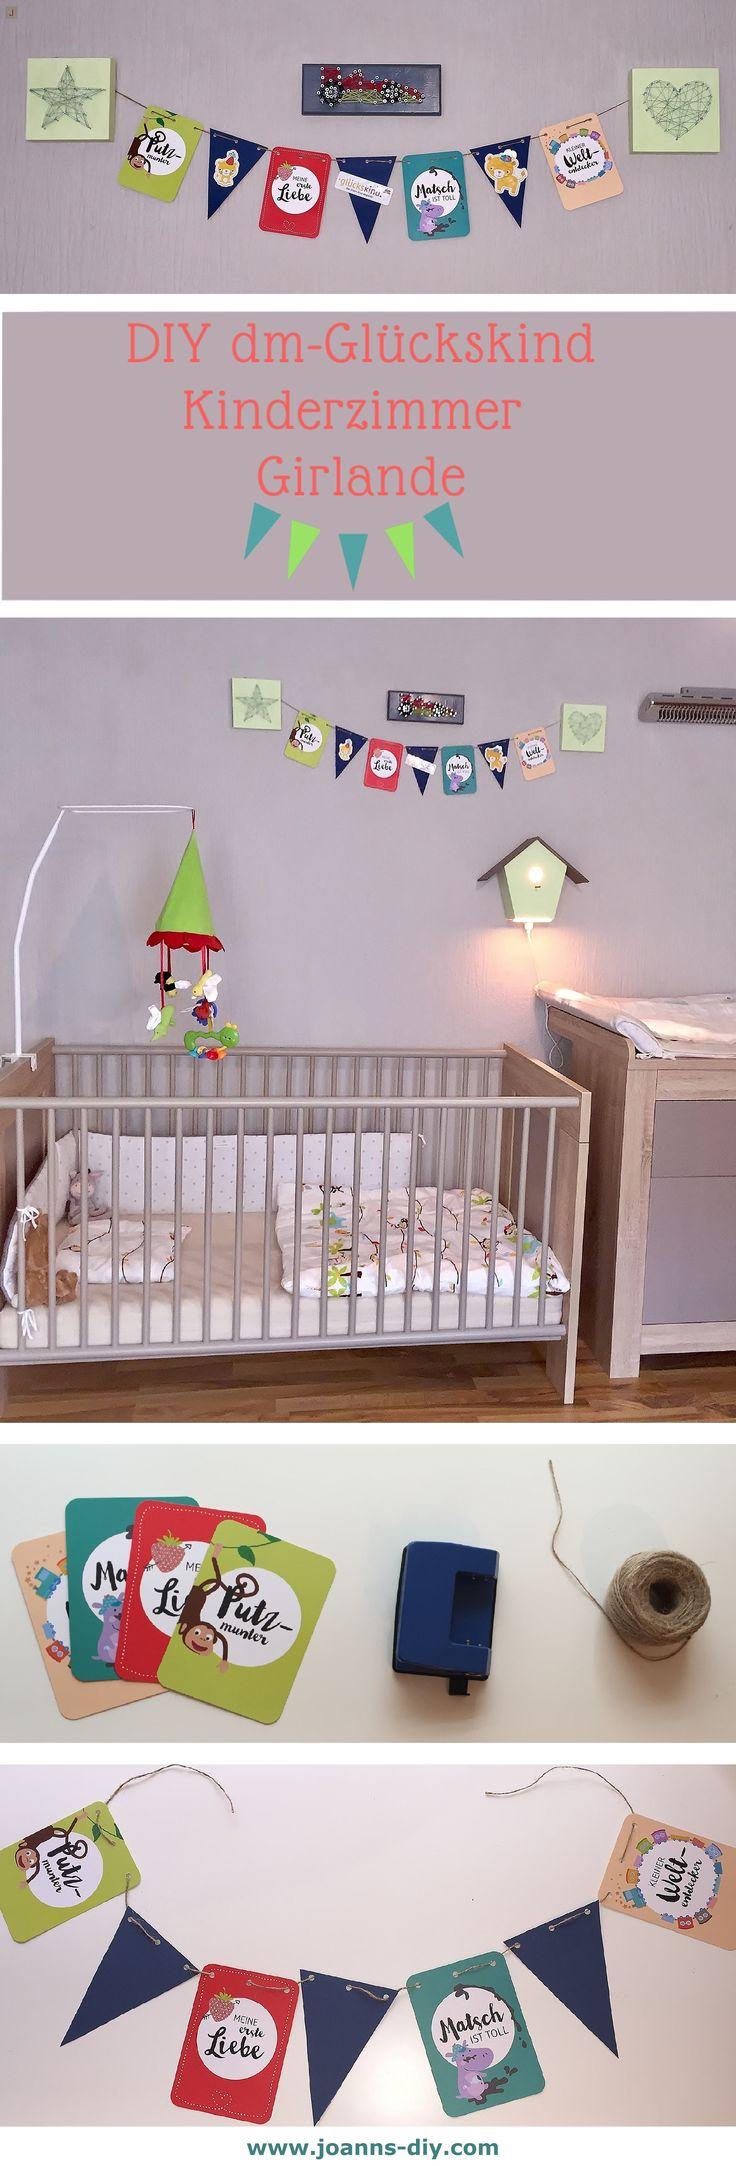 DIY dm-Drogerie Glückskind Girlande fürs Kinderzimmer selber machen #joanns-diy #diy #crafty #dm #glückskind